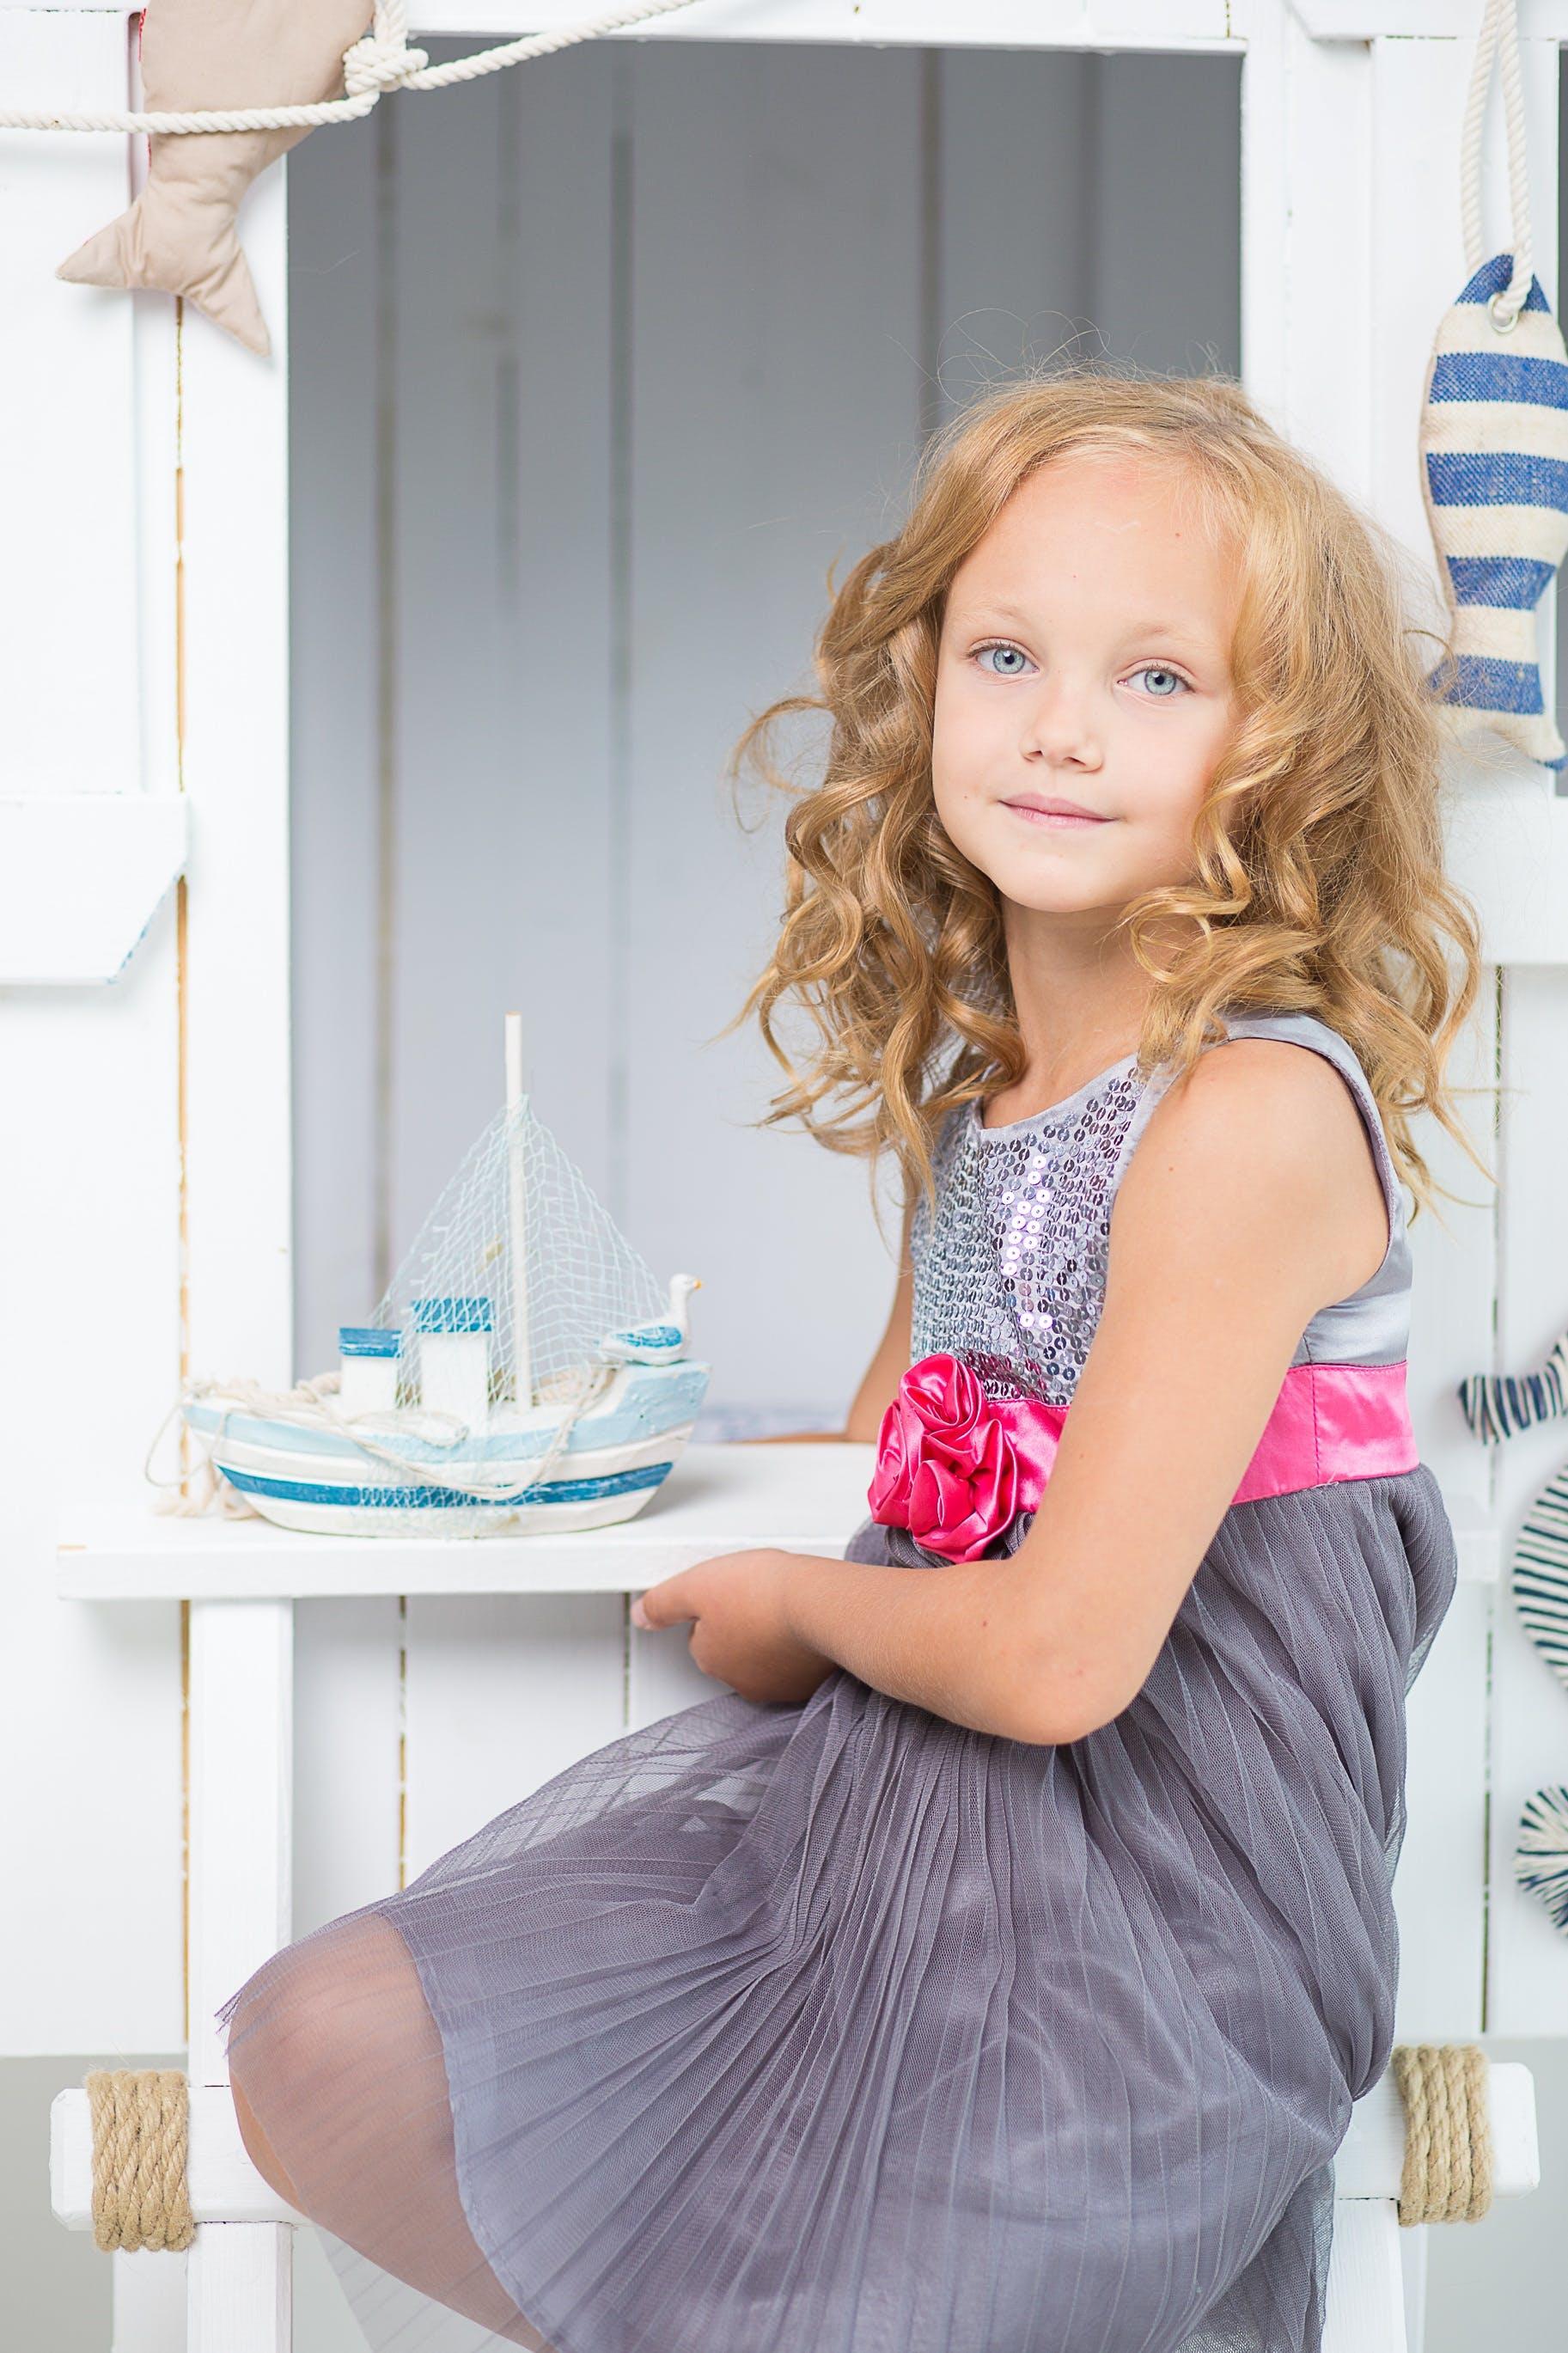 Kostenloses Stock Foto zu blond, hübsch, jung, kaukasisch